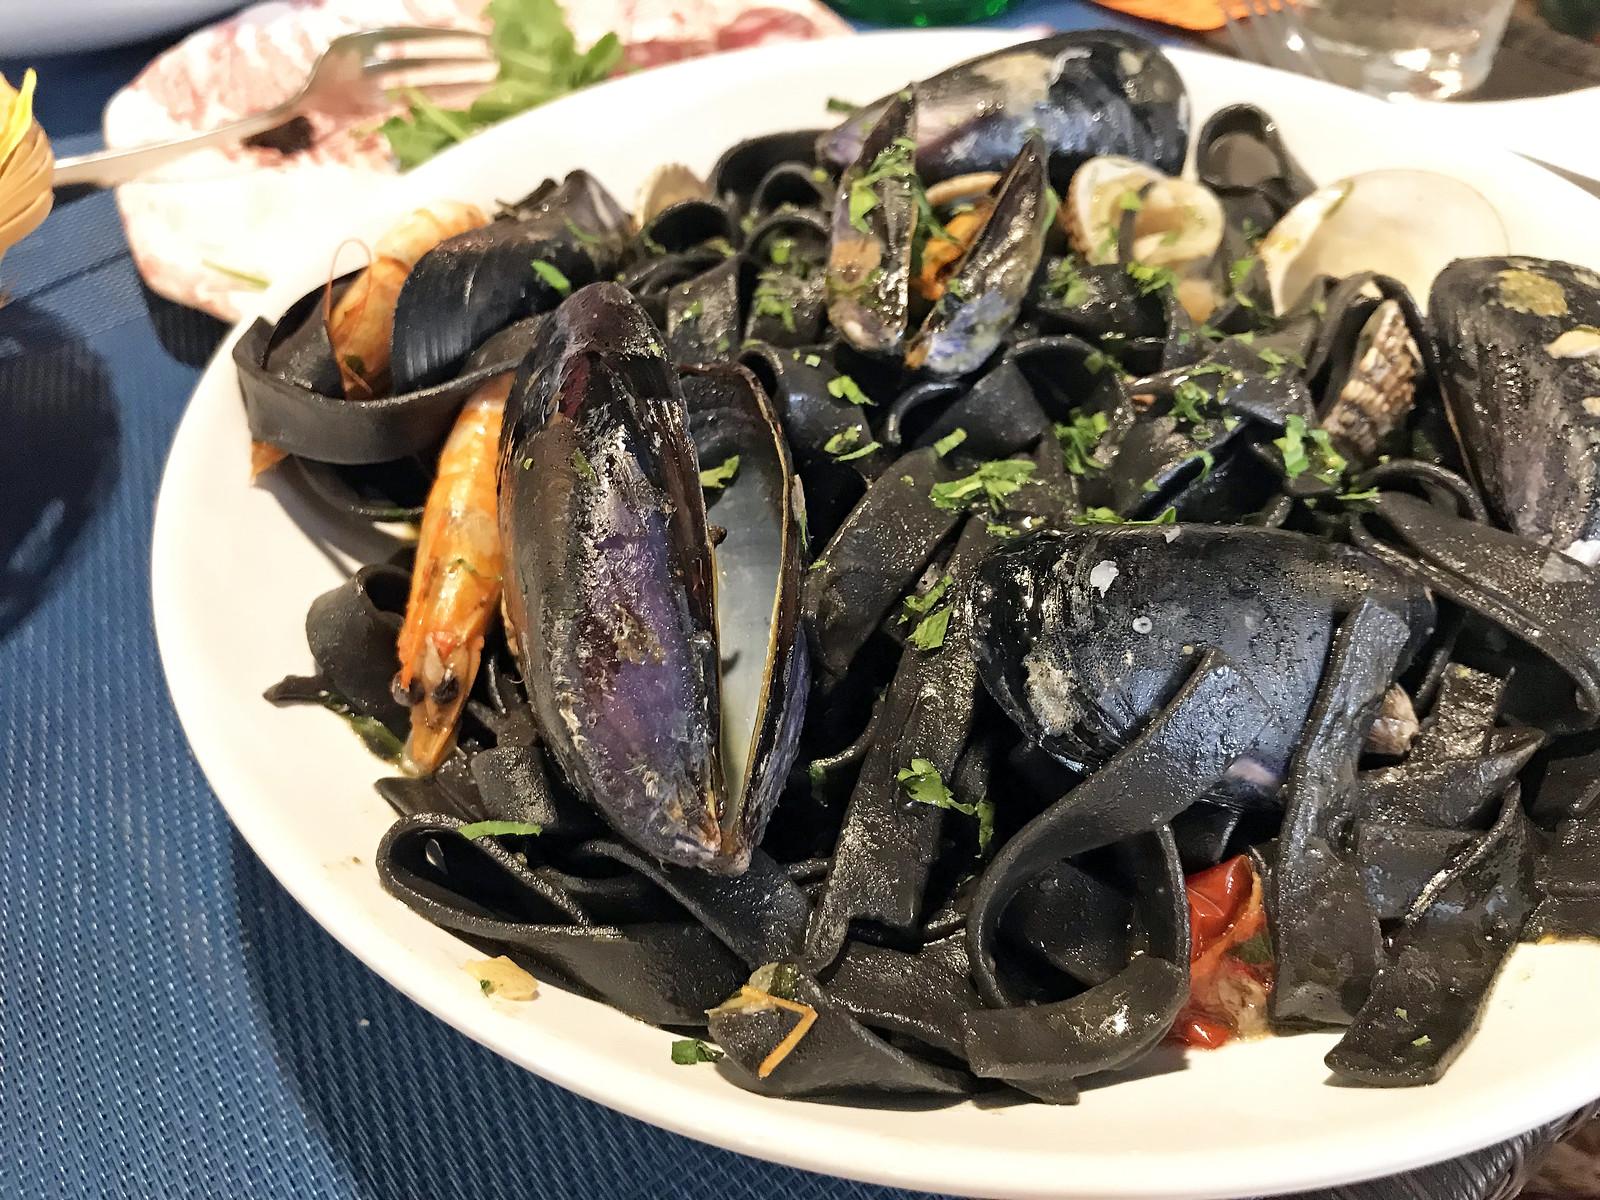 Homemade tagliatelle with shellfish at Kod sfinge vaneuropske zviri